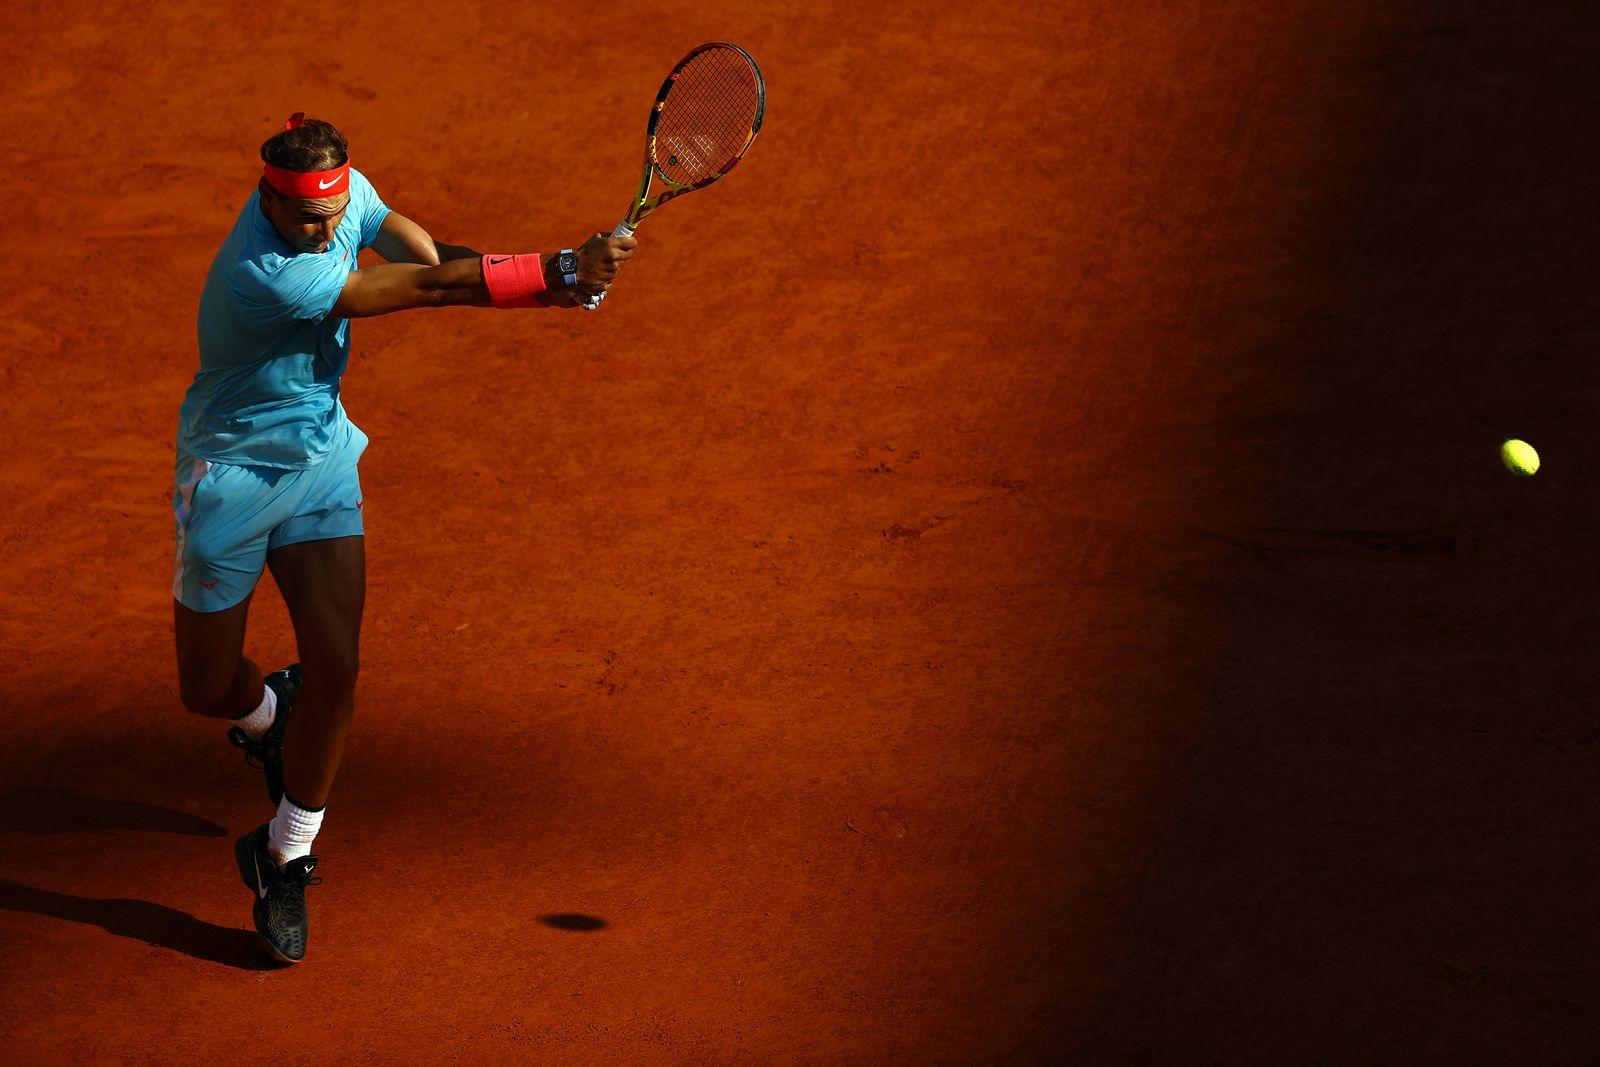 French Open tennis tournament at Roland Garros, Paris, France - 09 Oct 2020